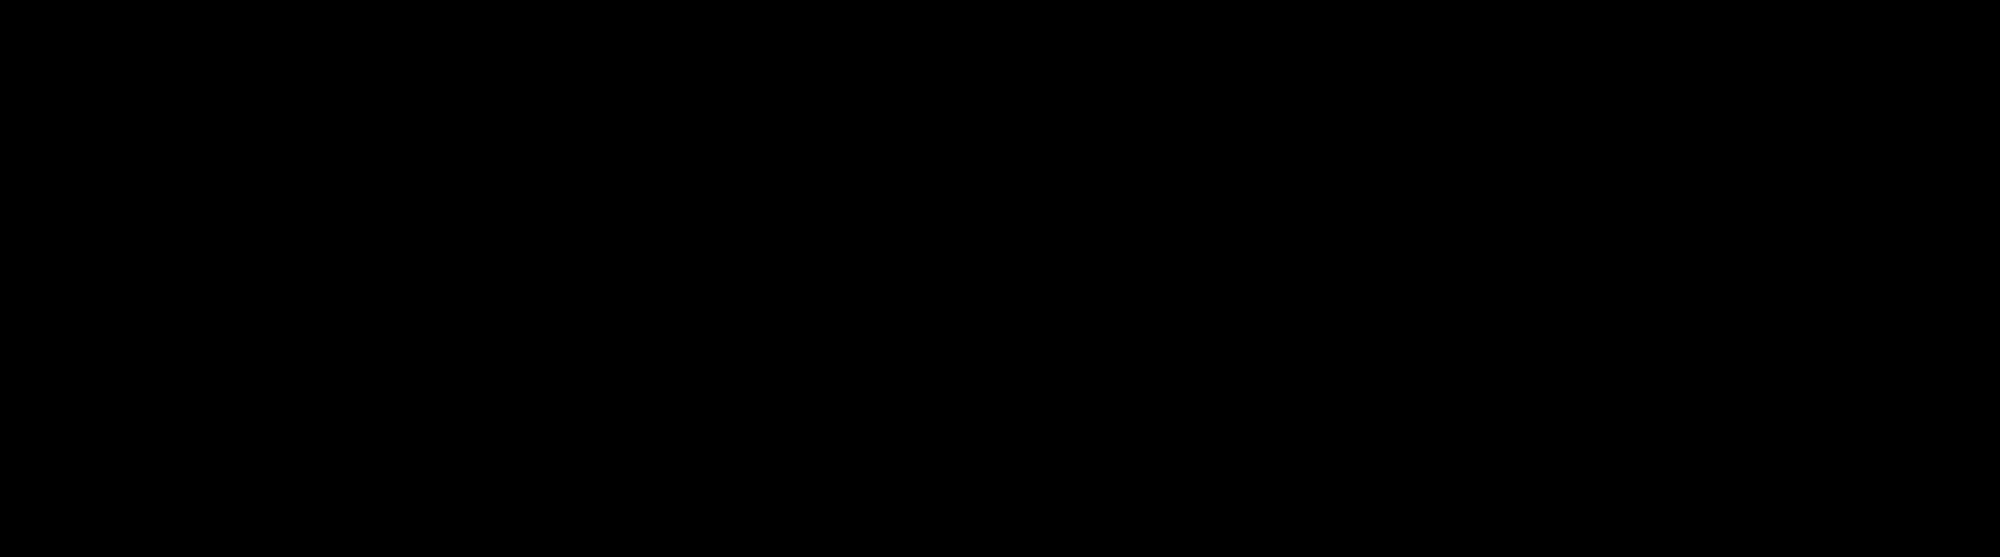 Open PlusPng.com  - Nestle Logo PNG